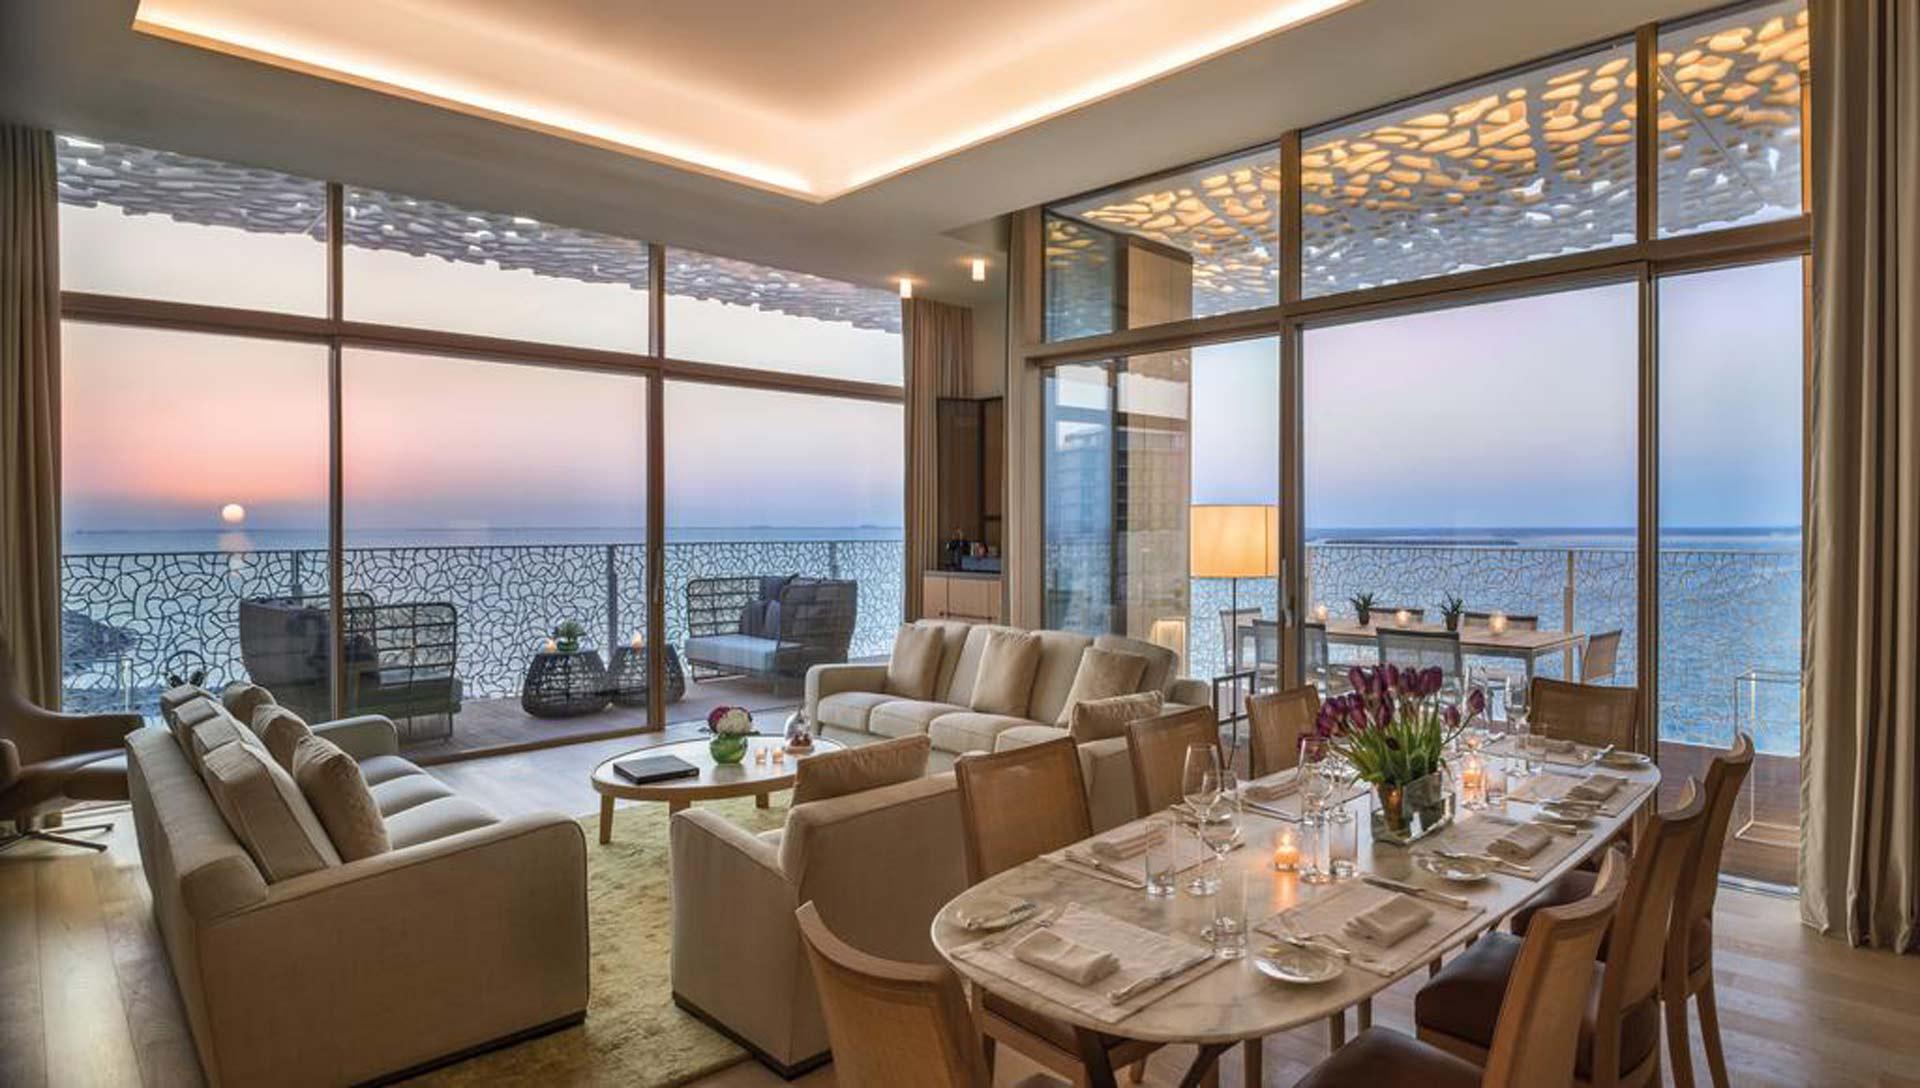 Carminati's oversized minimal frame windows and doors open up the Bvlgari Hotel dining room